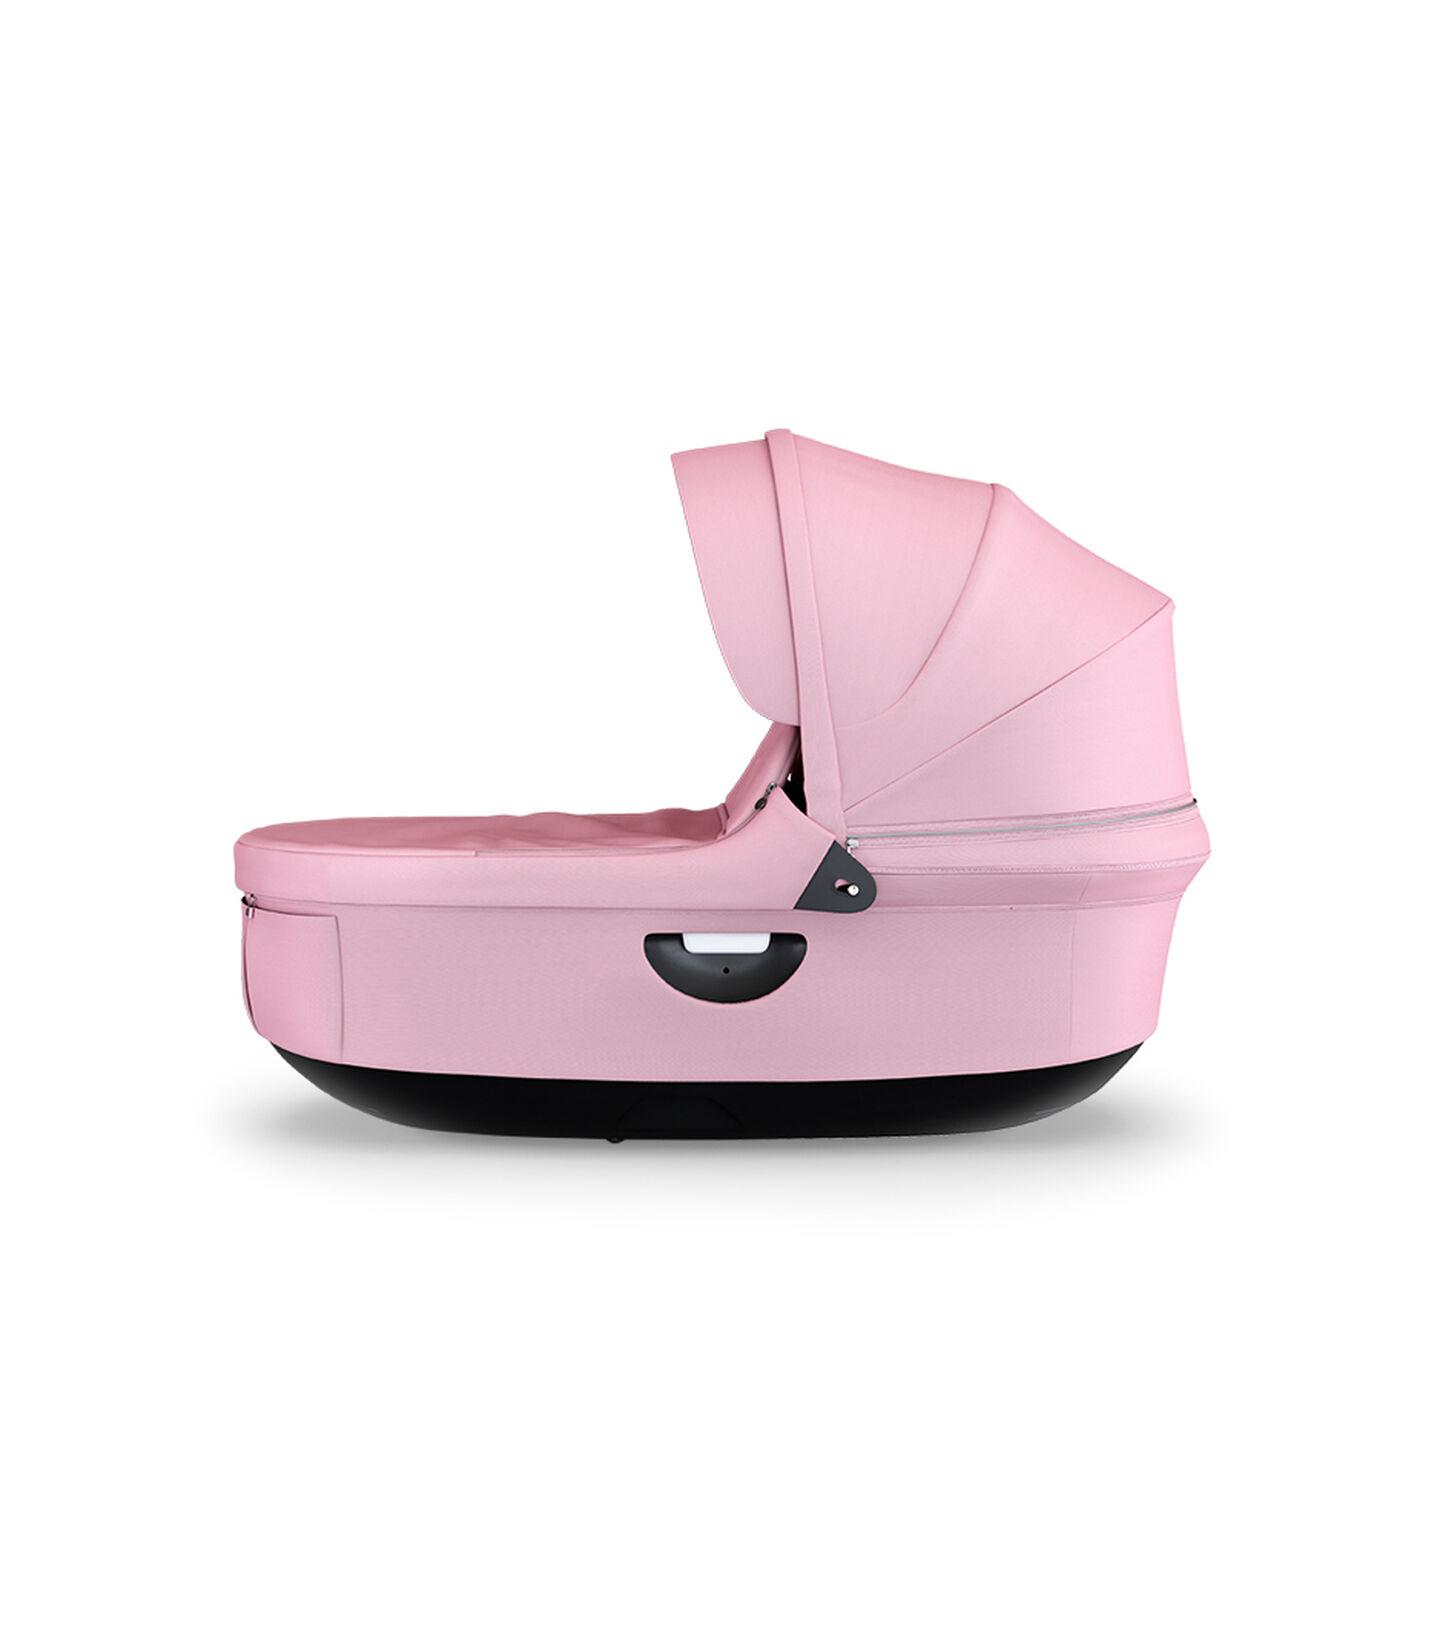 Strokke® Stroller Carry Cot, Lotus Pink.